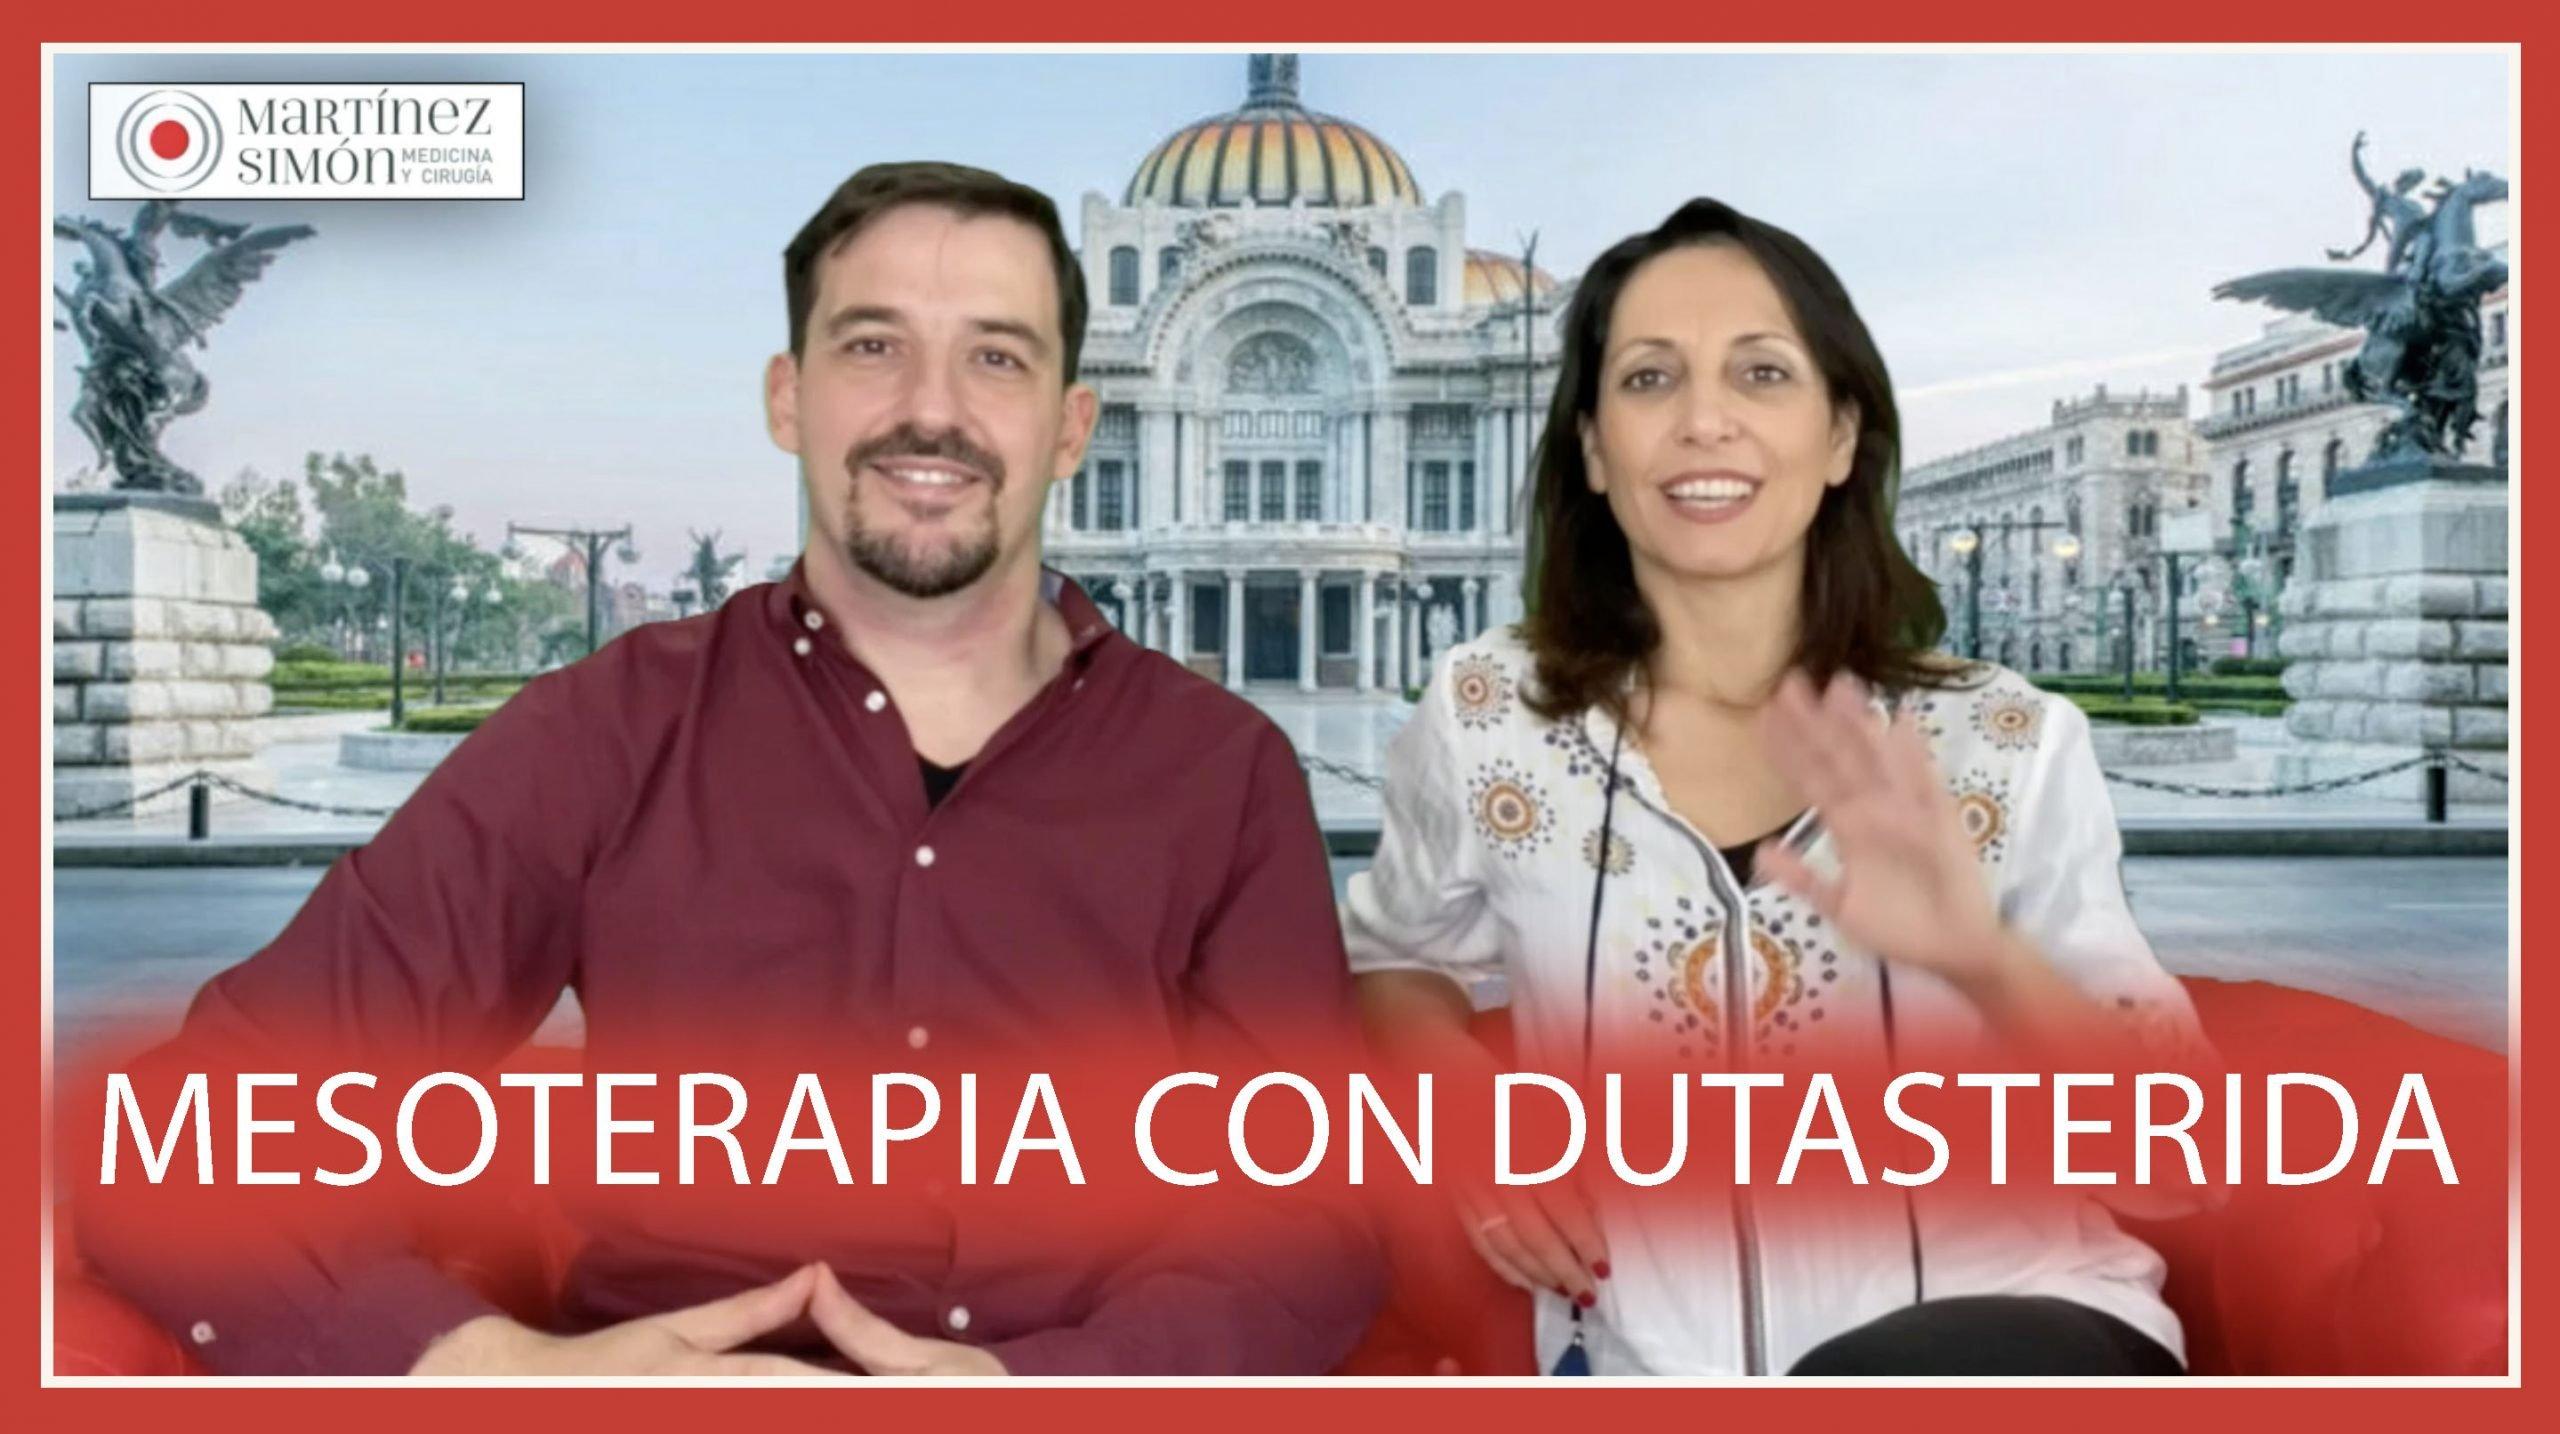 dutasteride-finasteride-dutasterida-finasterida-injerto-capilar-castellon-trasplante